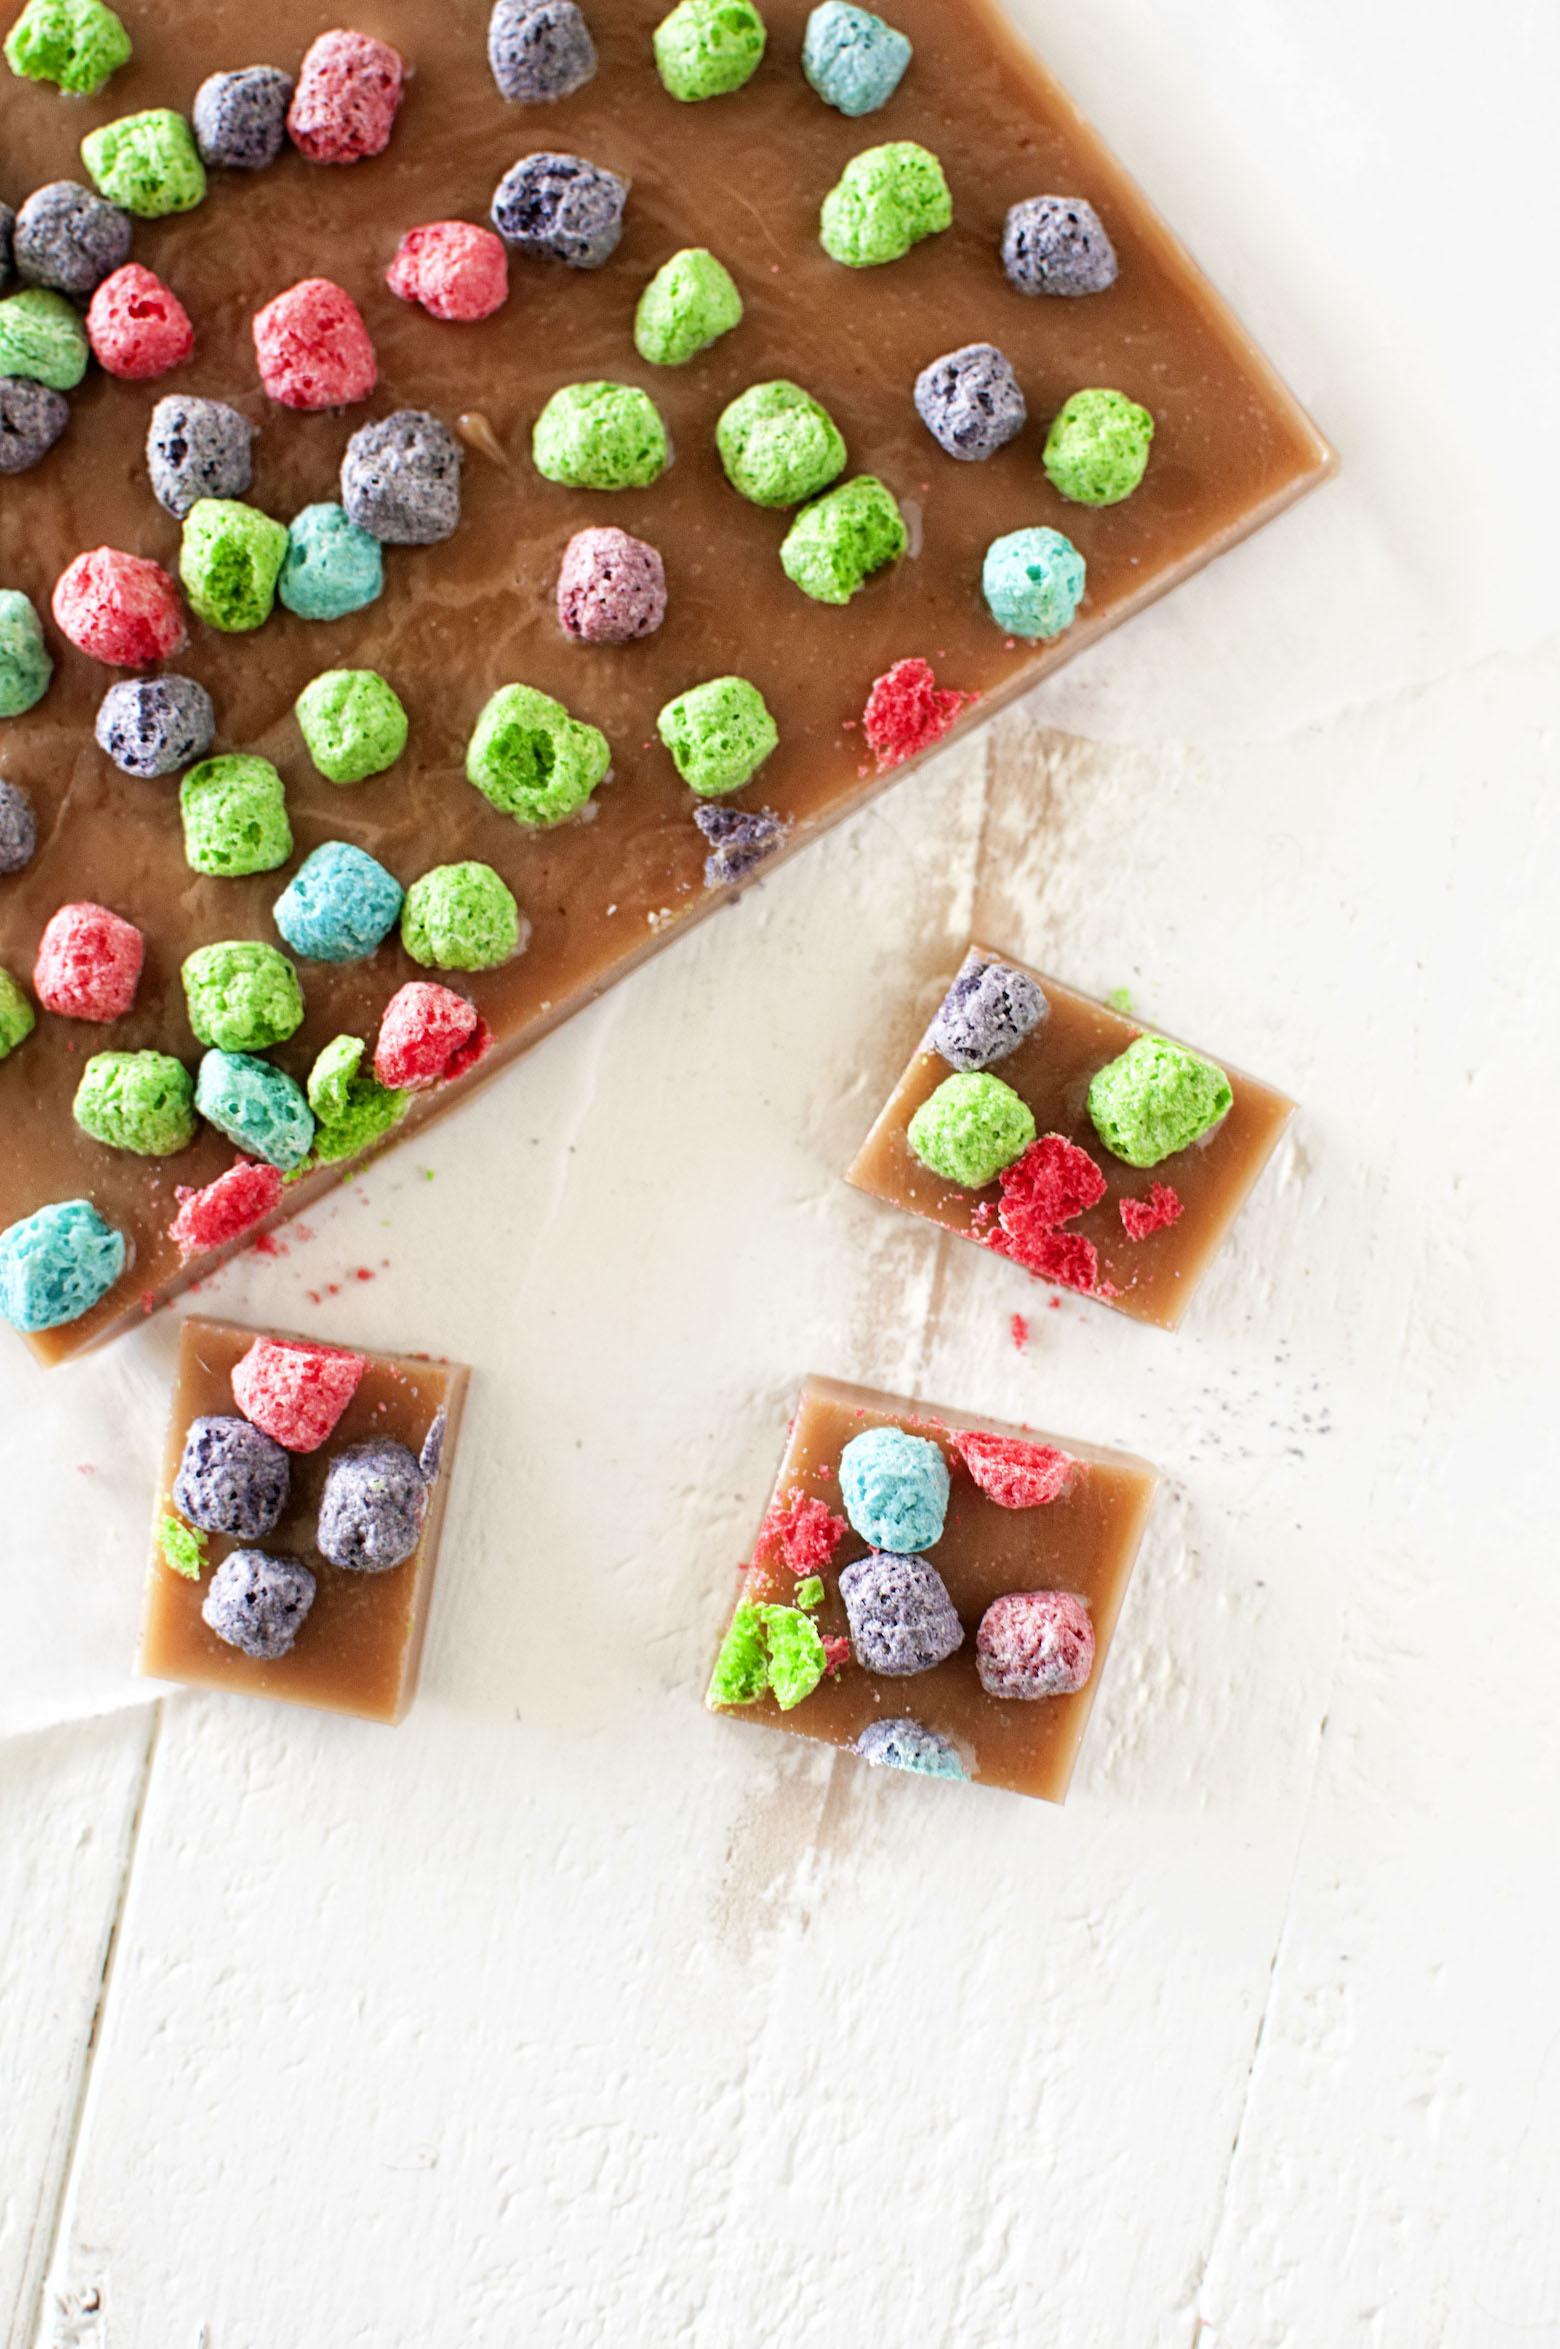 Overhead shot of Crunch Berry Caramels